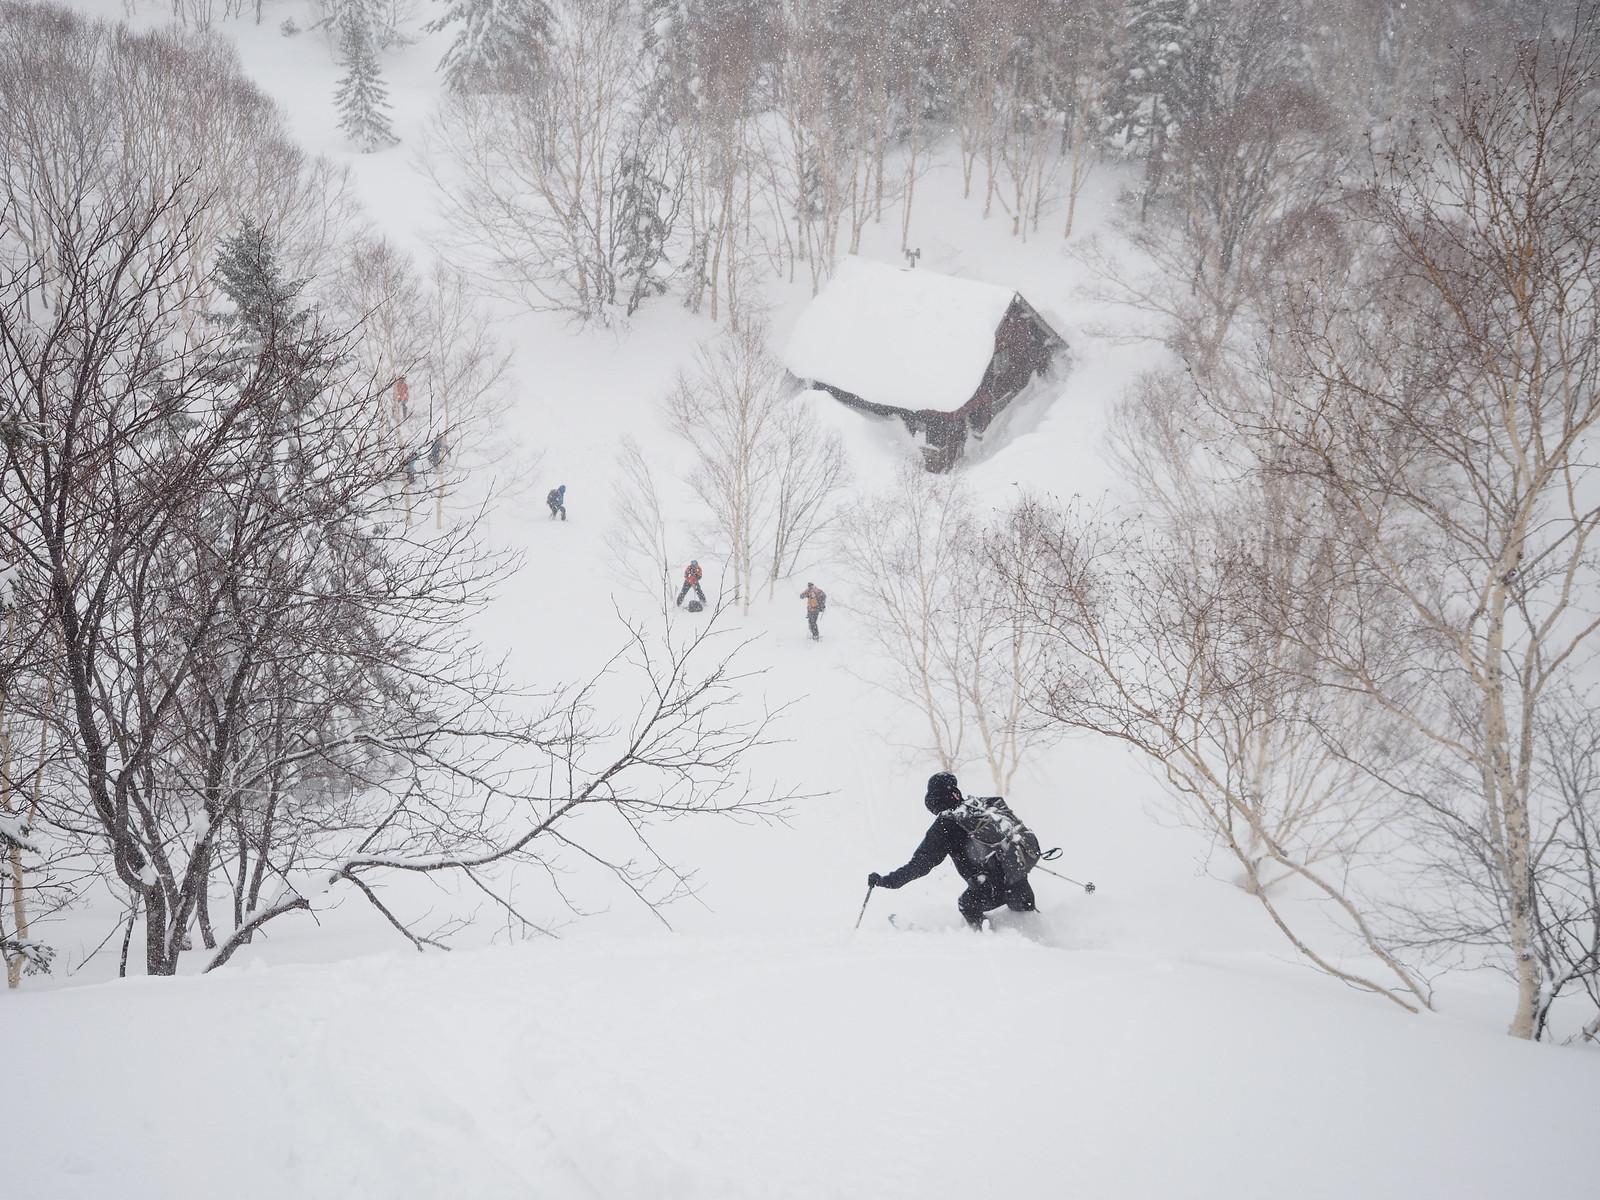 Muine Hut ski touring (Sapporo City, Hokkaido, Japan)